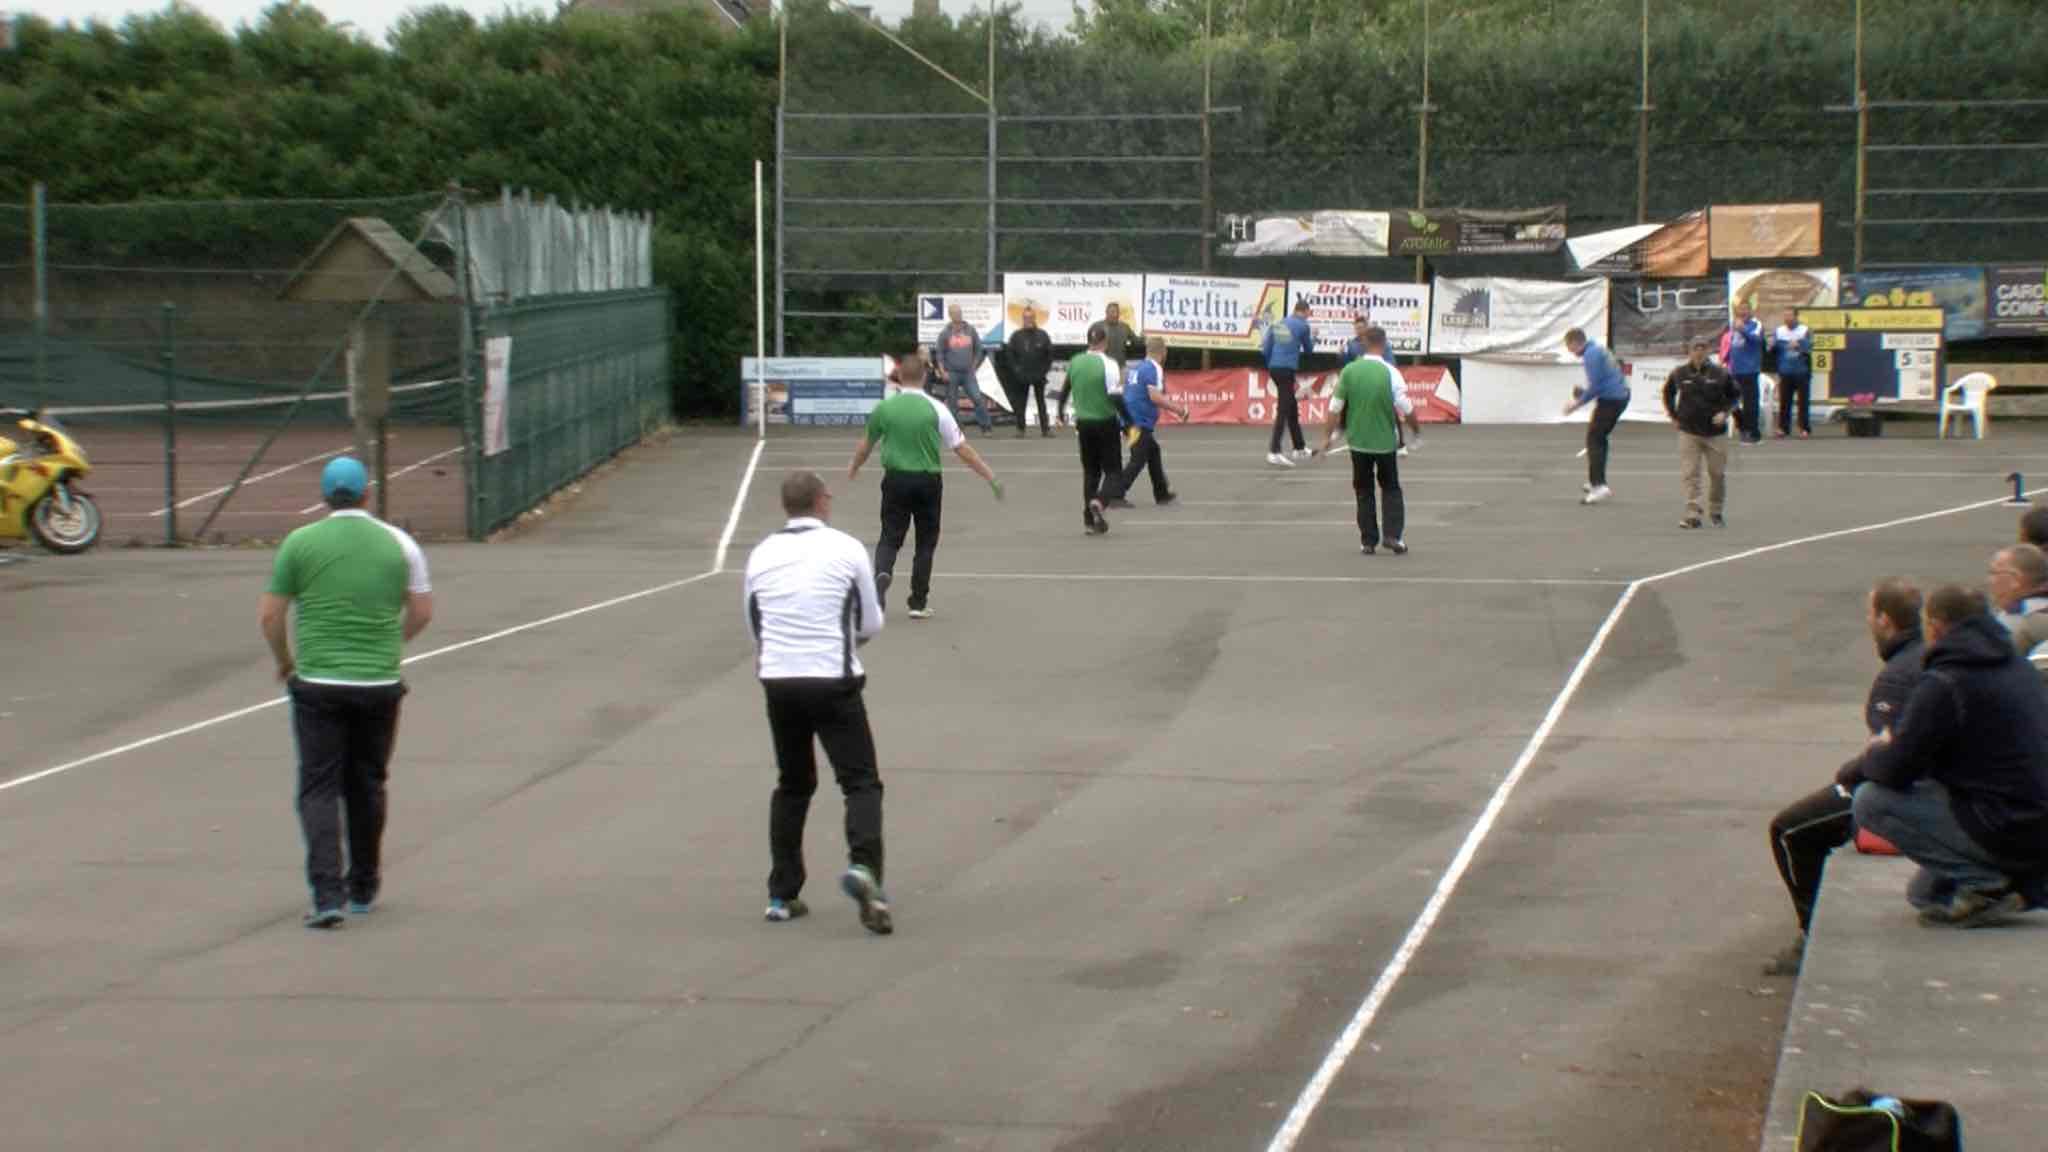 Balle Pelote, Ligue W/B: Bassilly gagne le derby sillyen face à Hoves, 13-7